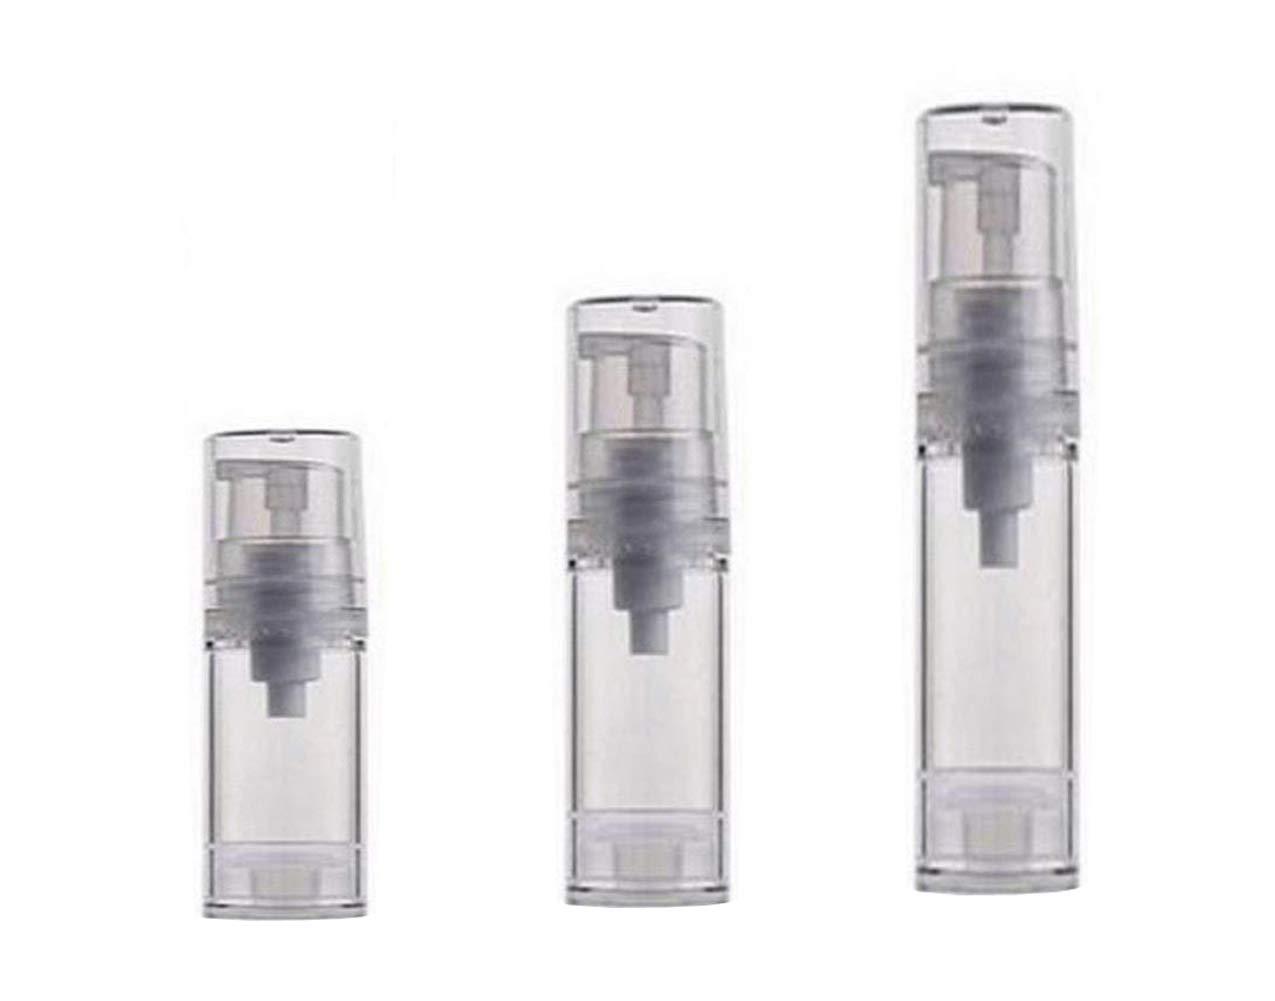 3PCS 5ML+10ML+15ML Empty Refillable Airless Plastic Bottle Vacuum Pump Press Foam Container